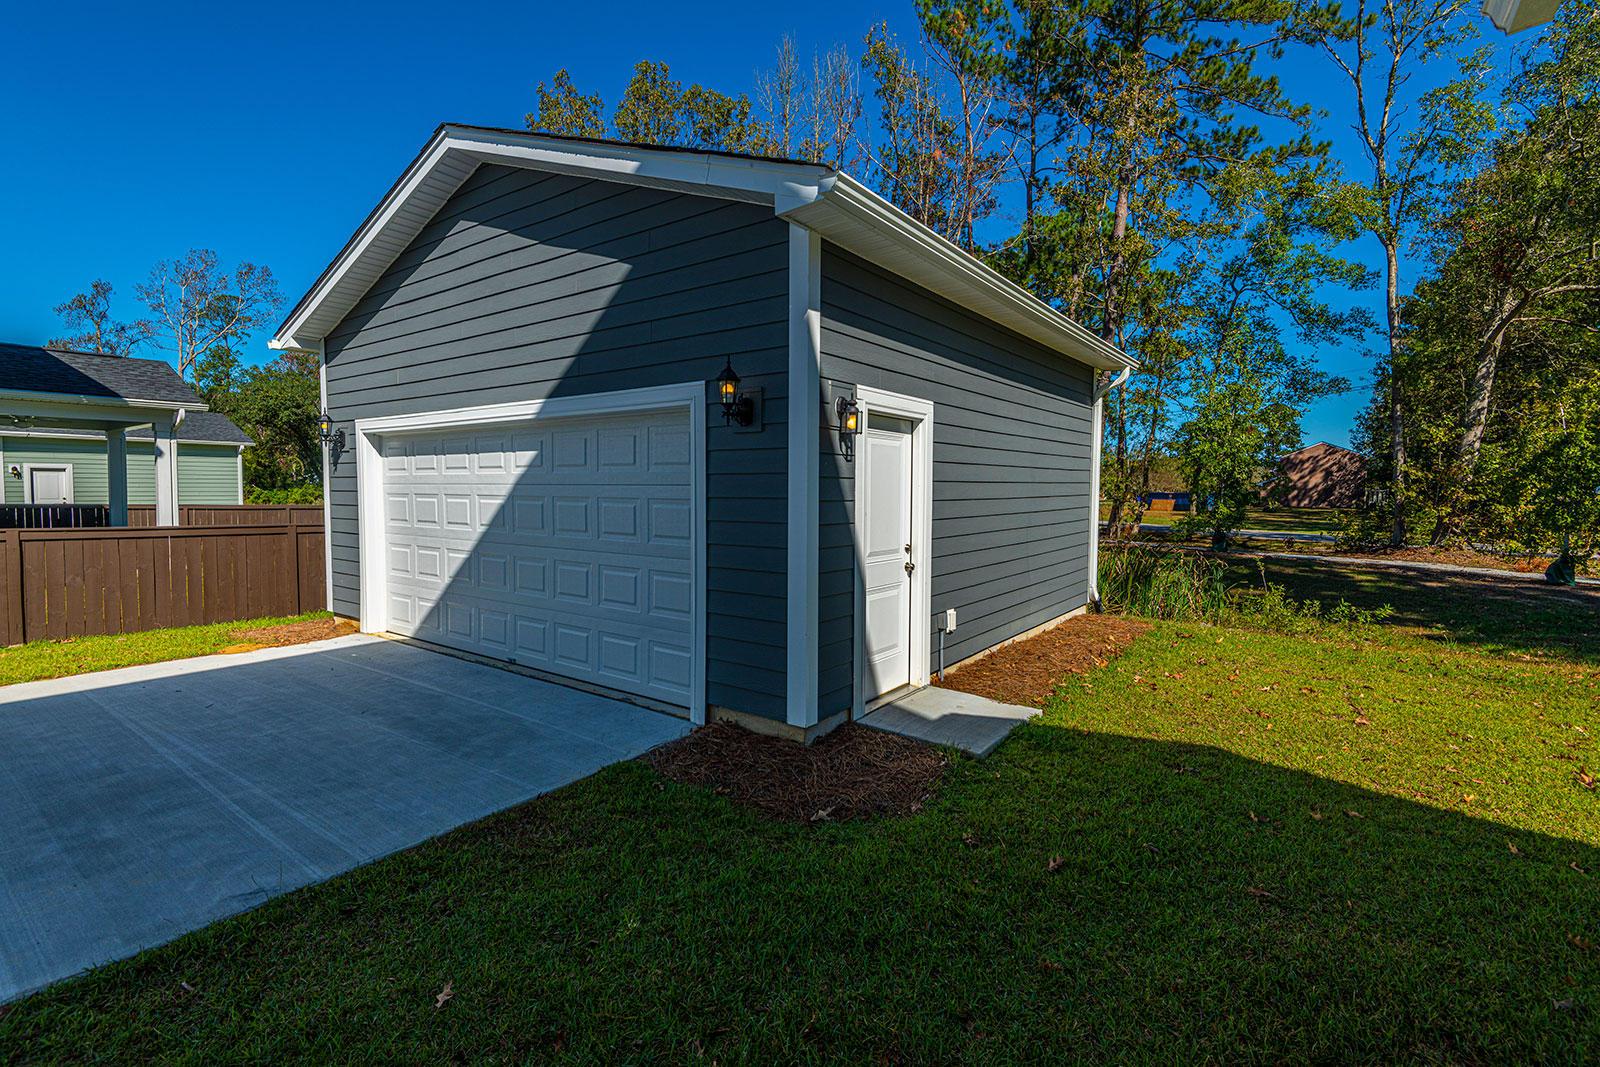 Church Creek Landing Homes For Sale - 2302 Town Woods, Charleston, SC - 2